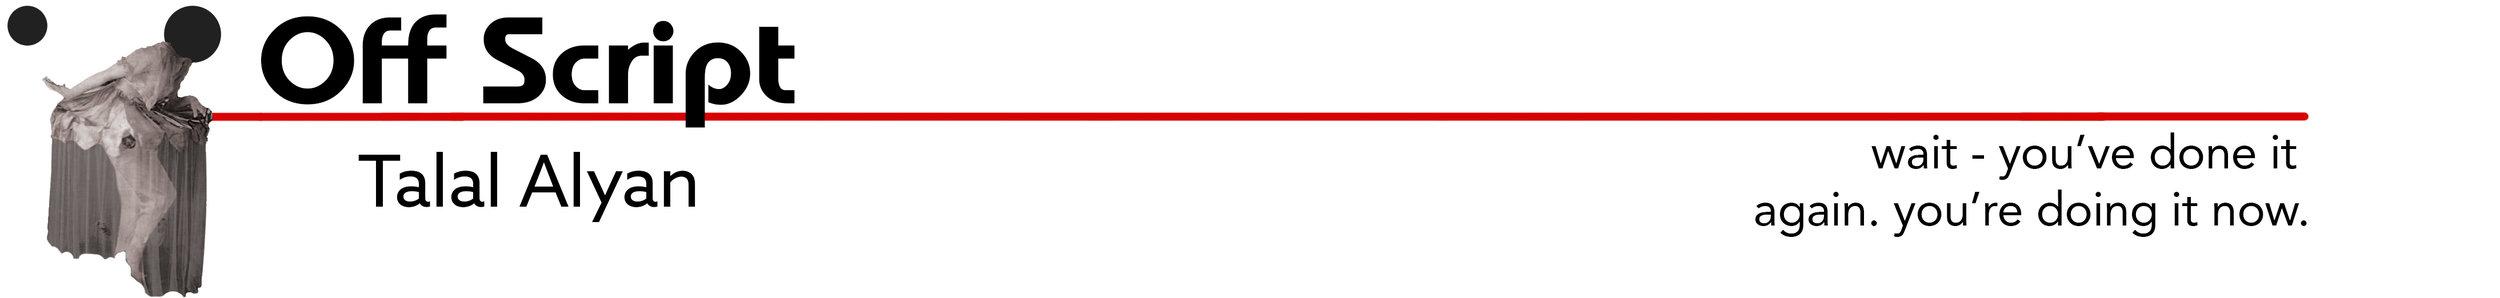 Web I4 - Off Script.jpg